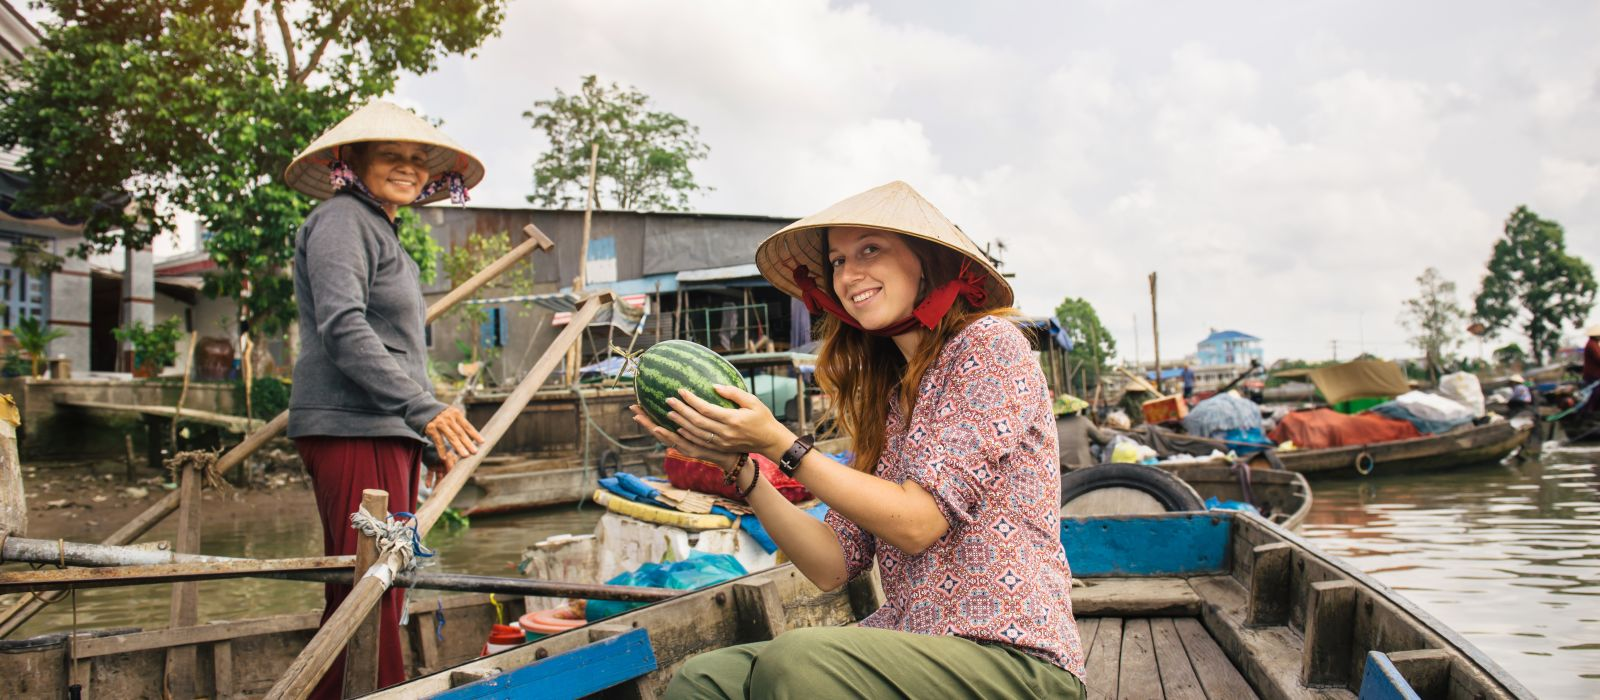 Vietnam Hautnah: Von Hanoi nach Saigon Urlaub 5